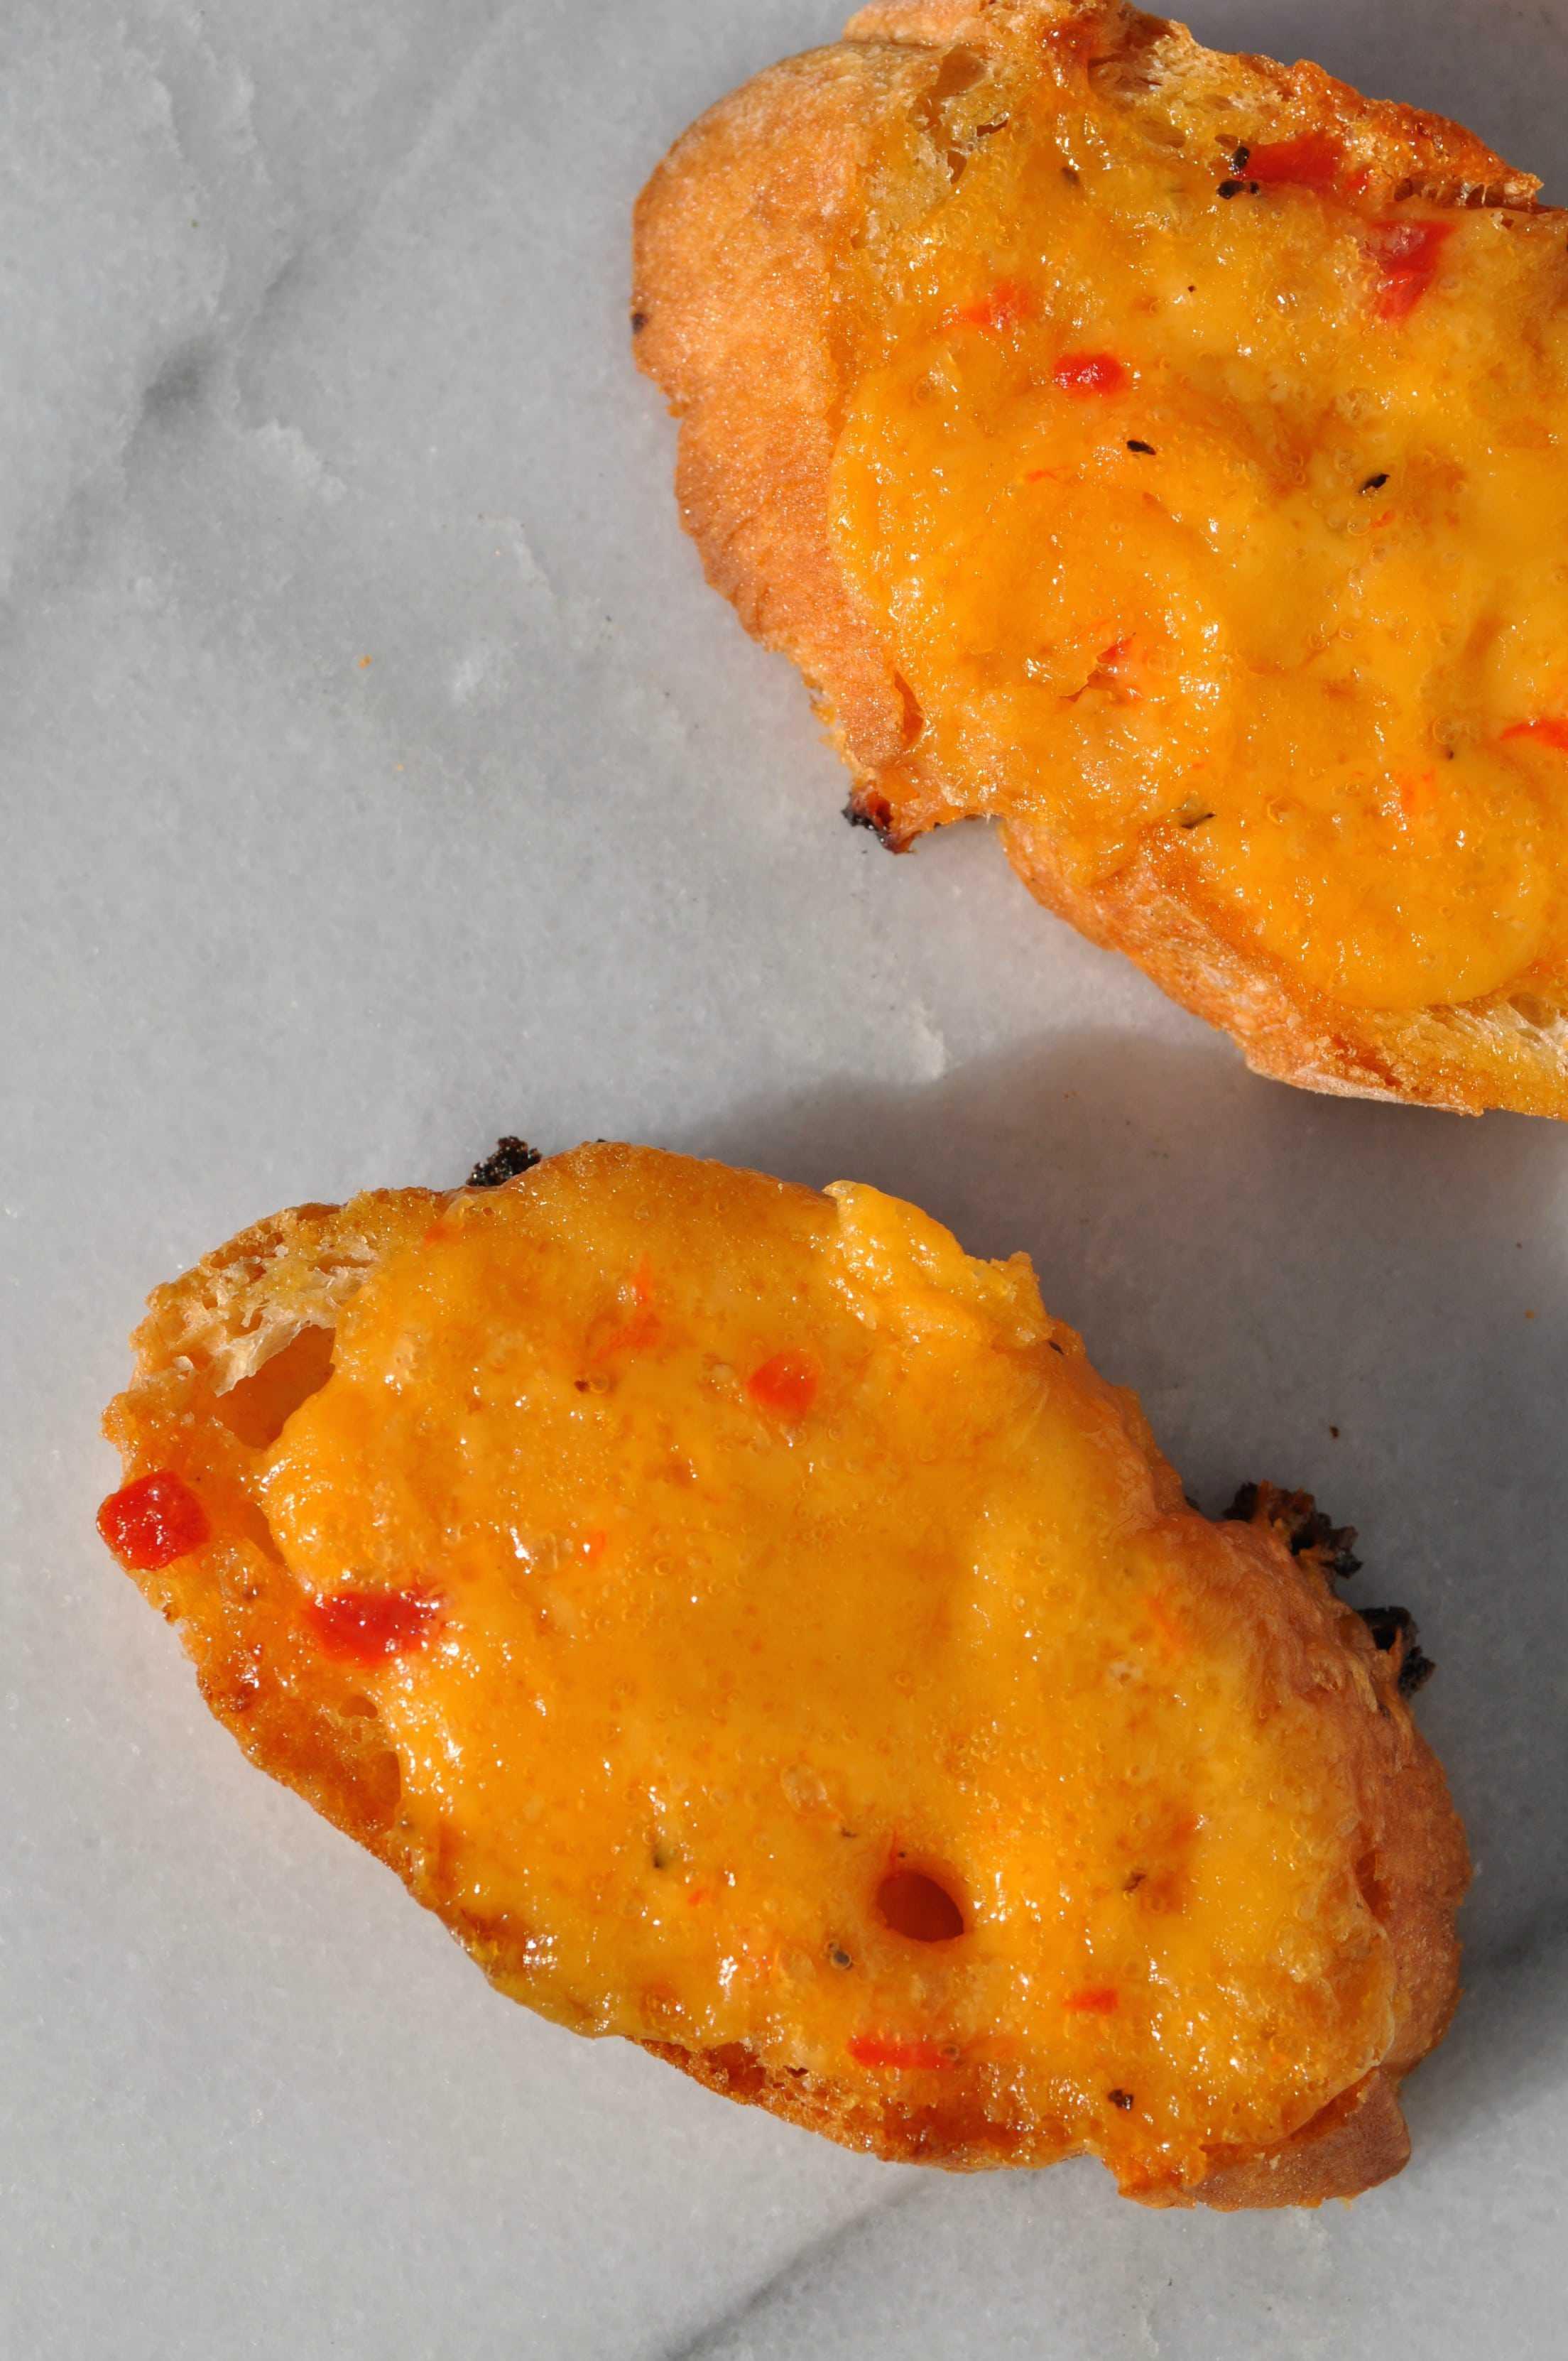 ... Ingredient Appetizer: Kerrin's Pimento Cheese Bites - The Seasoned Mom